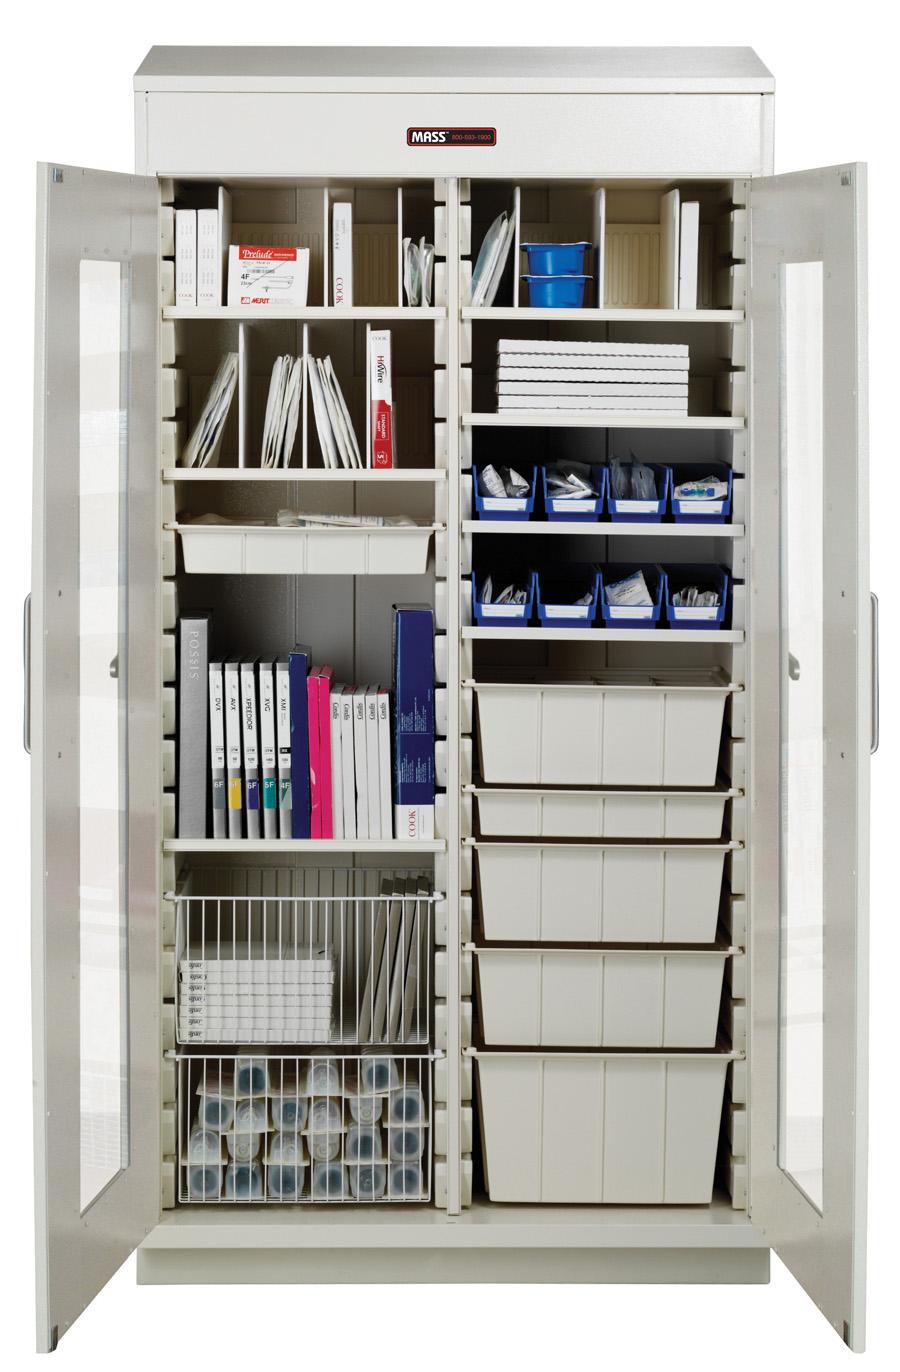 Exchange Supply CabinetMX4400DHG  Storage Systems Unlimited